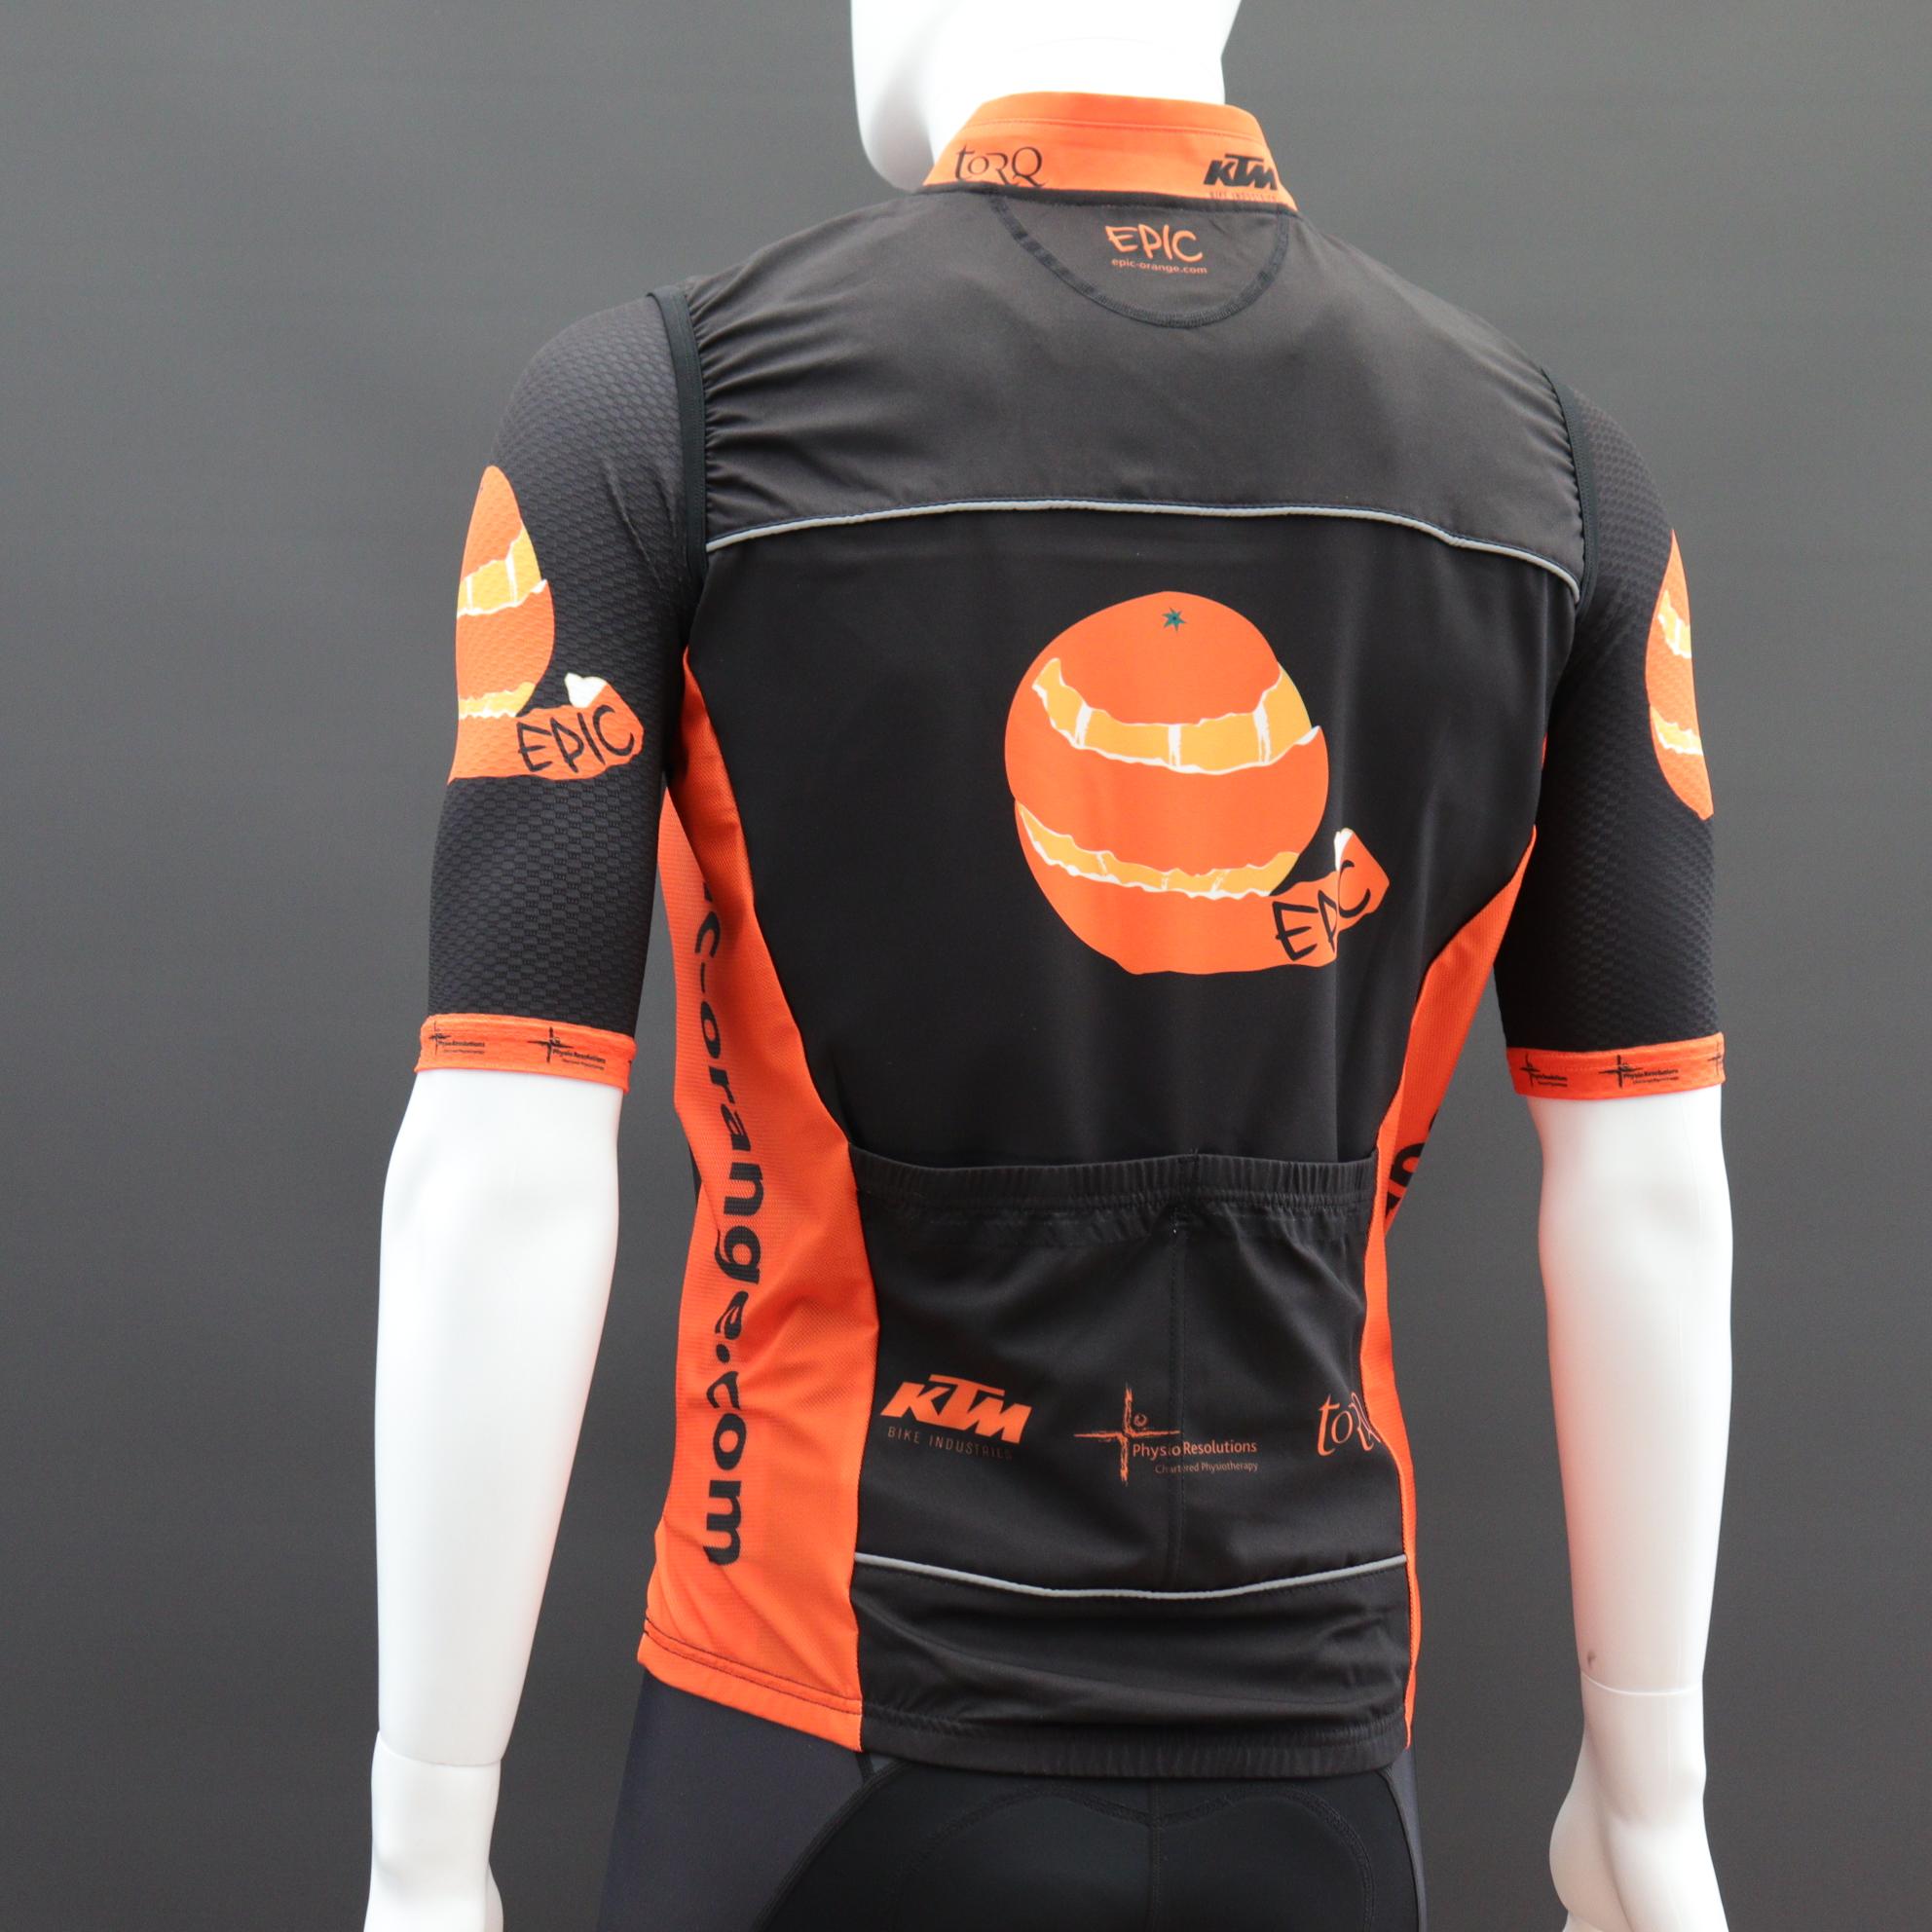 Custom Printed Pro Cut Cycle Gilets